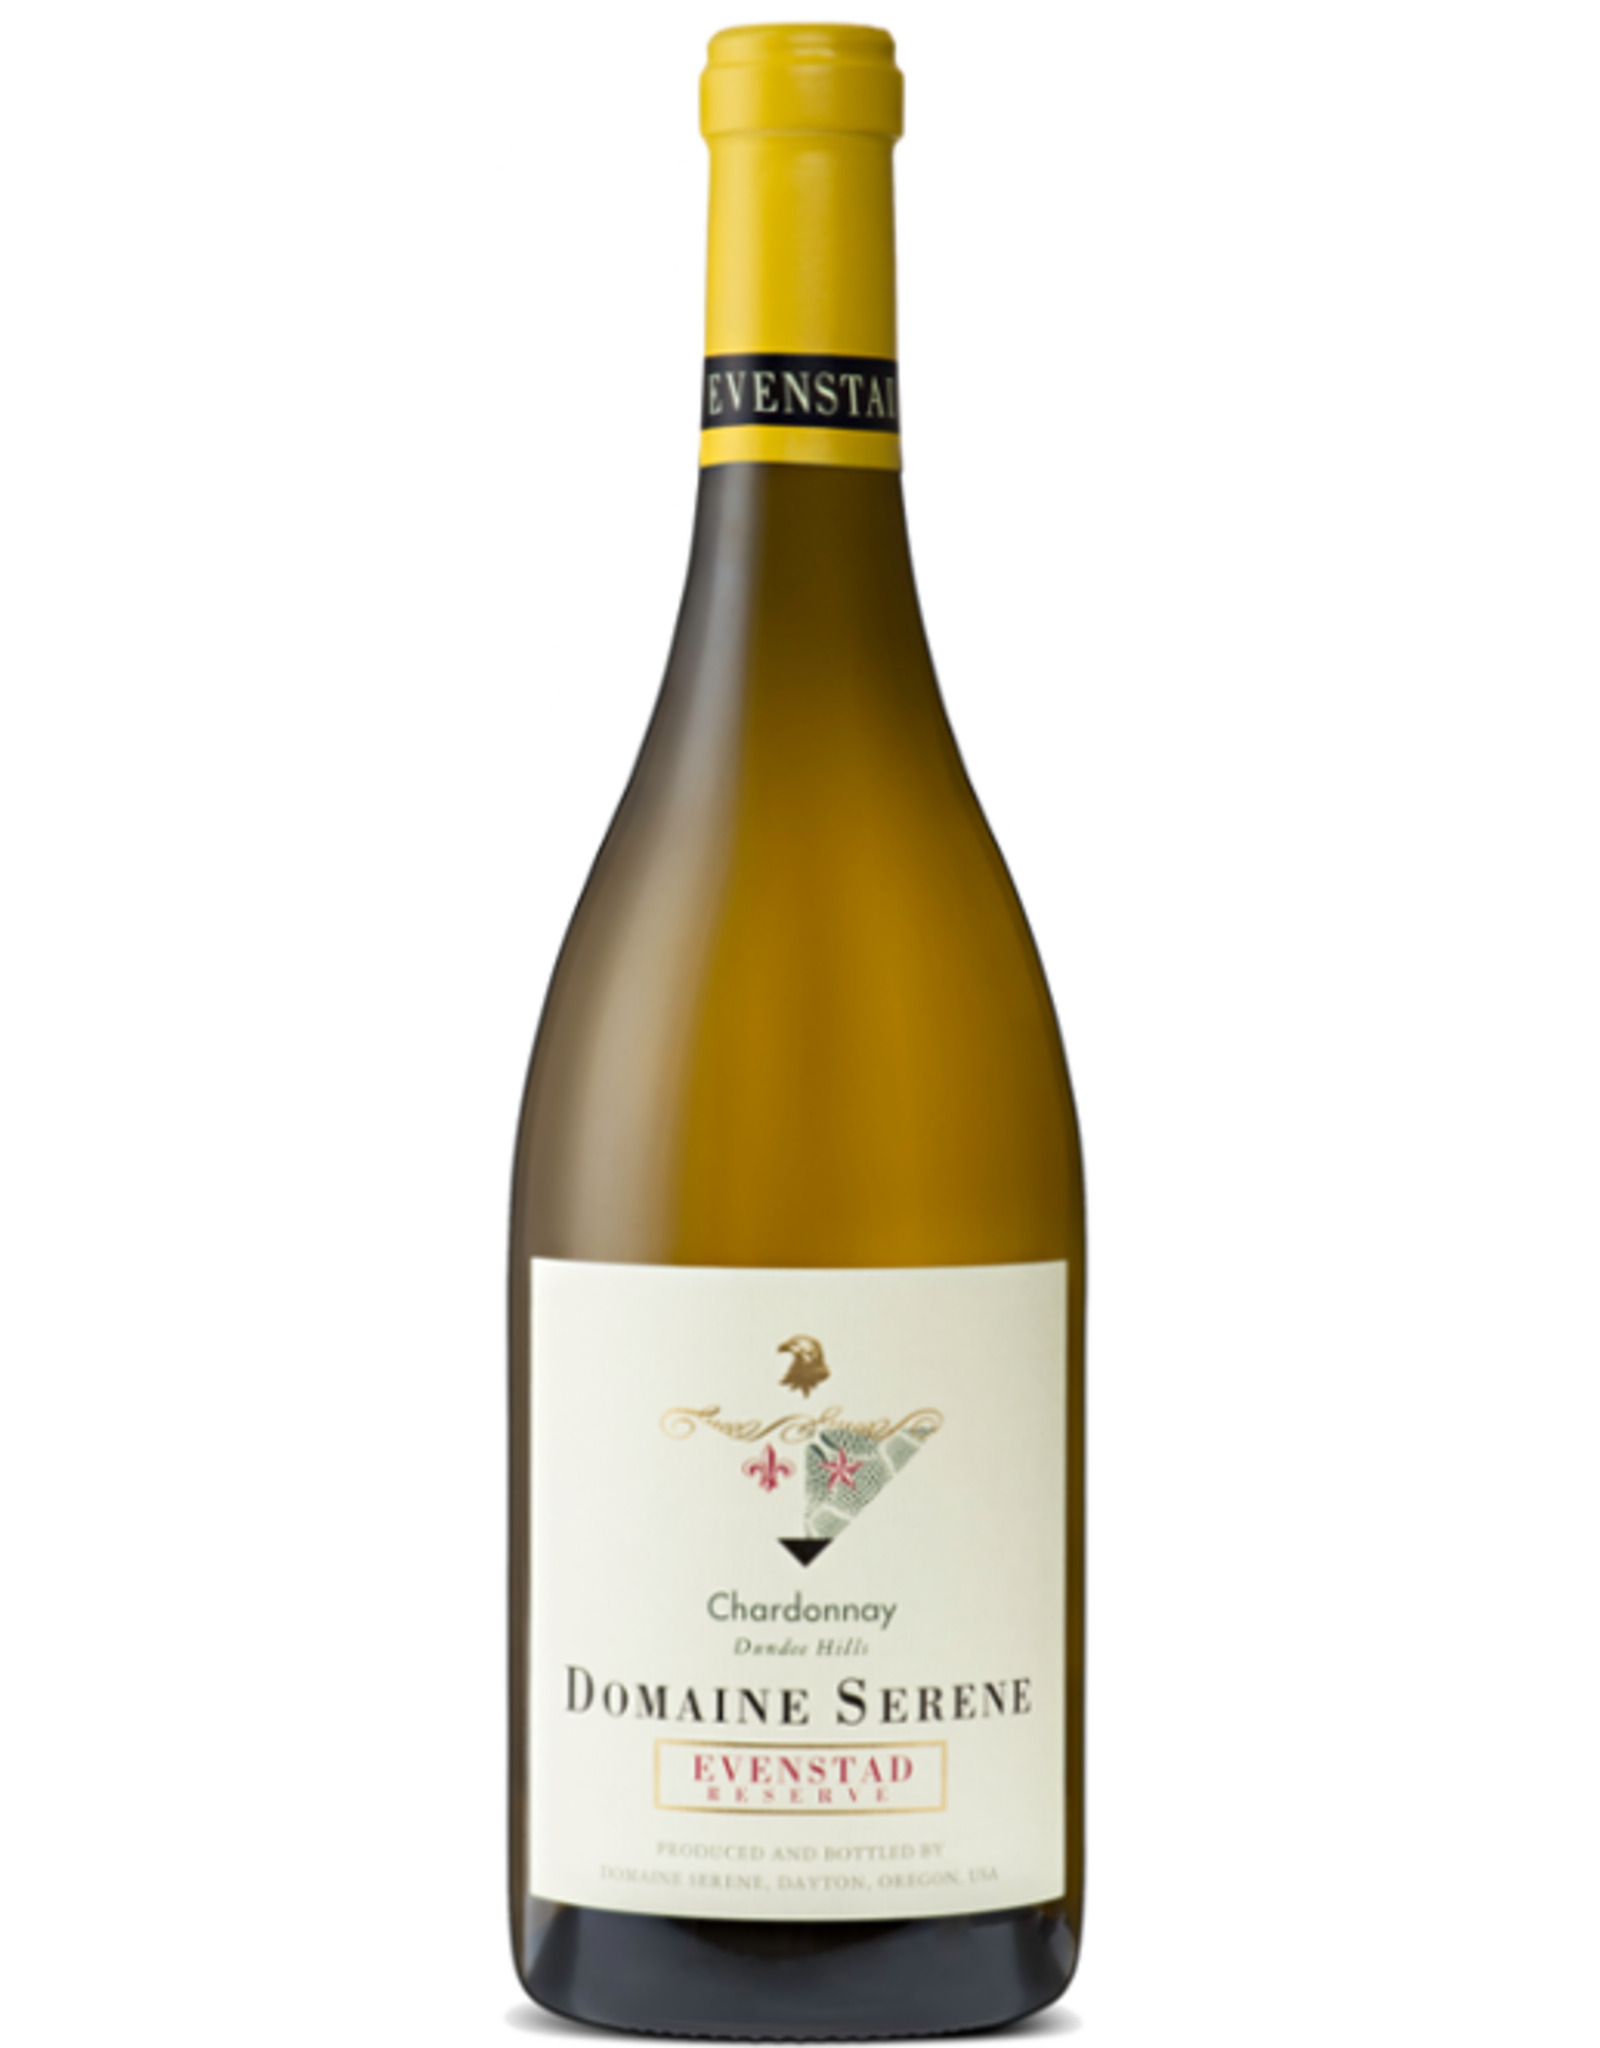 Domaine Serene Evenstad Reserve Chardonnay 2016